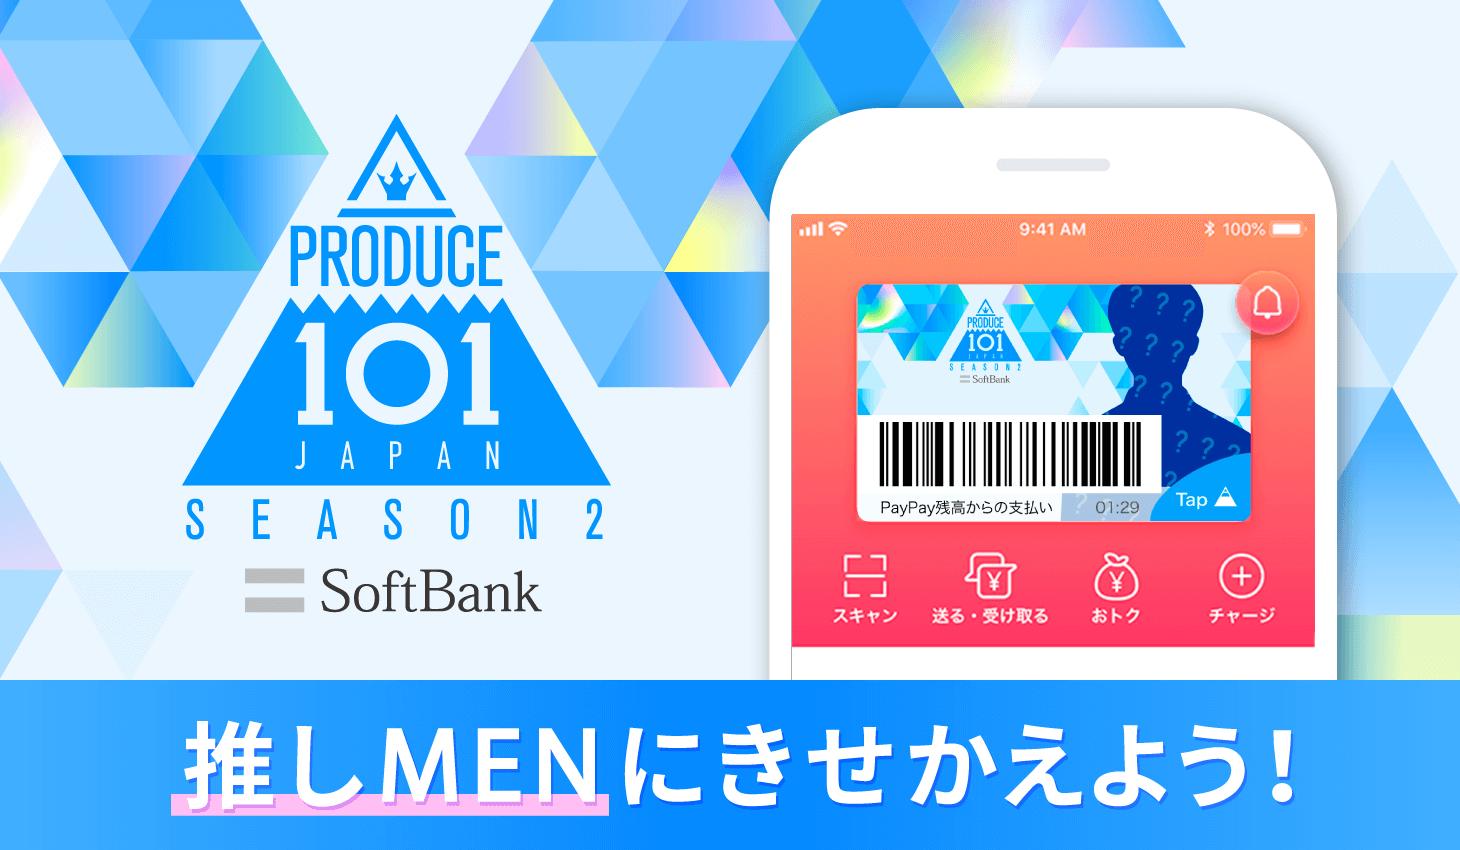 PRODUCE 101 JAPAN SEASON2 推しMENにきせかえよう!